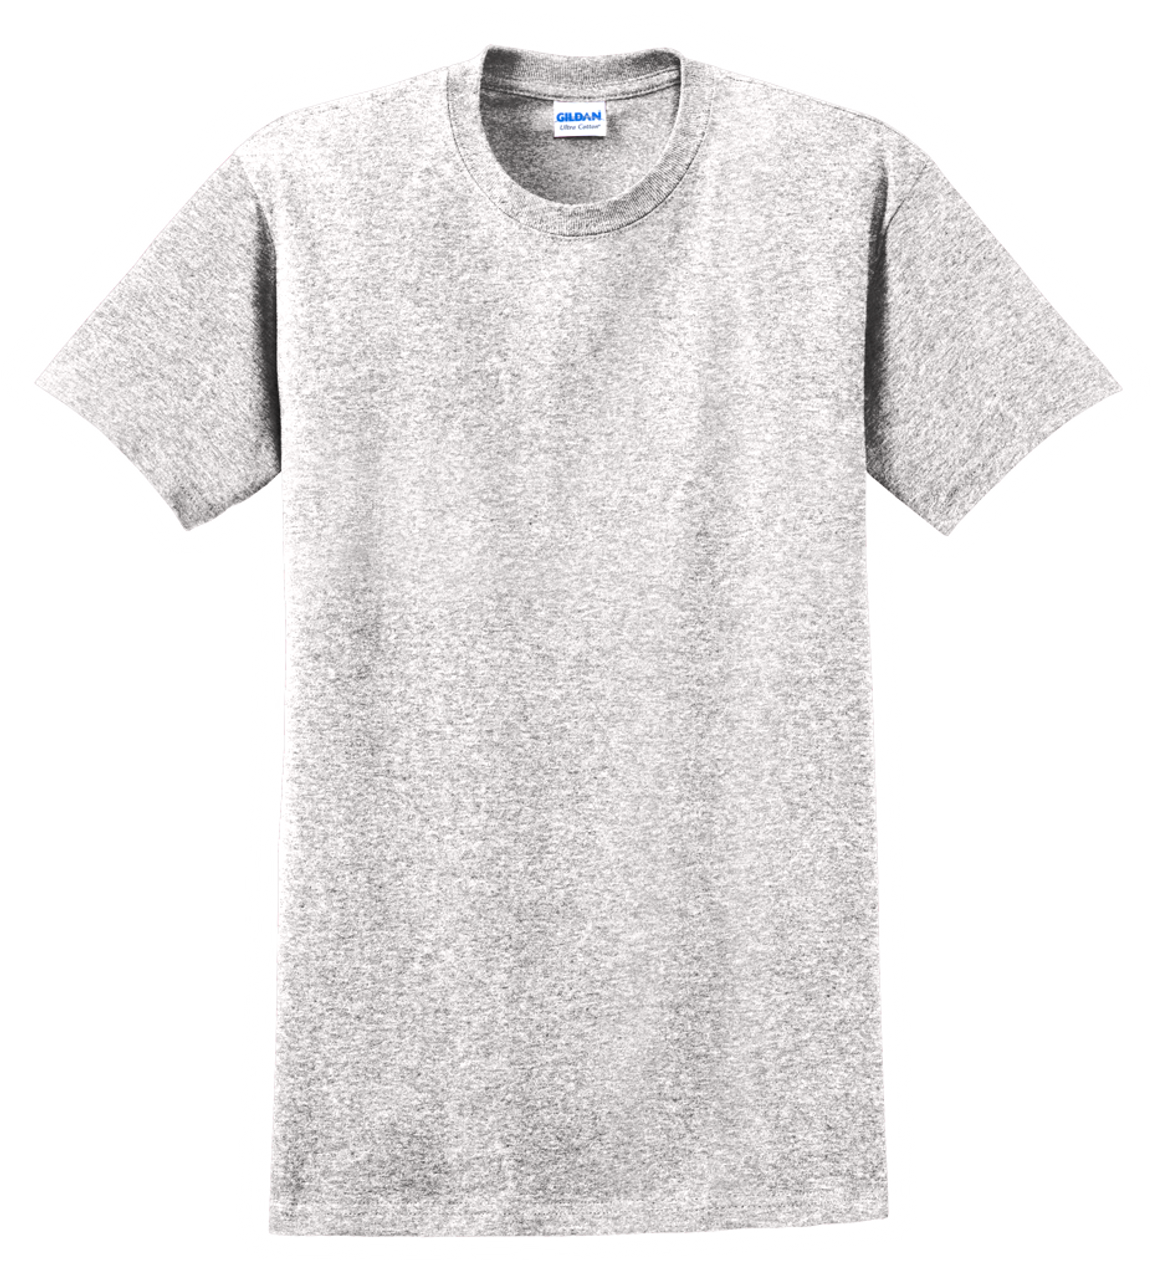 G2000B Ash Youth T-Shirt Short Sleeve by Gildan